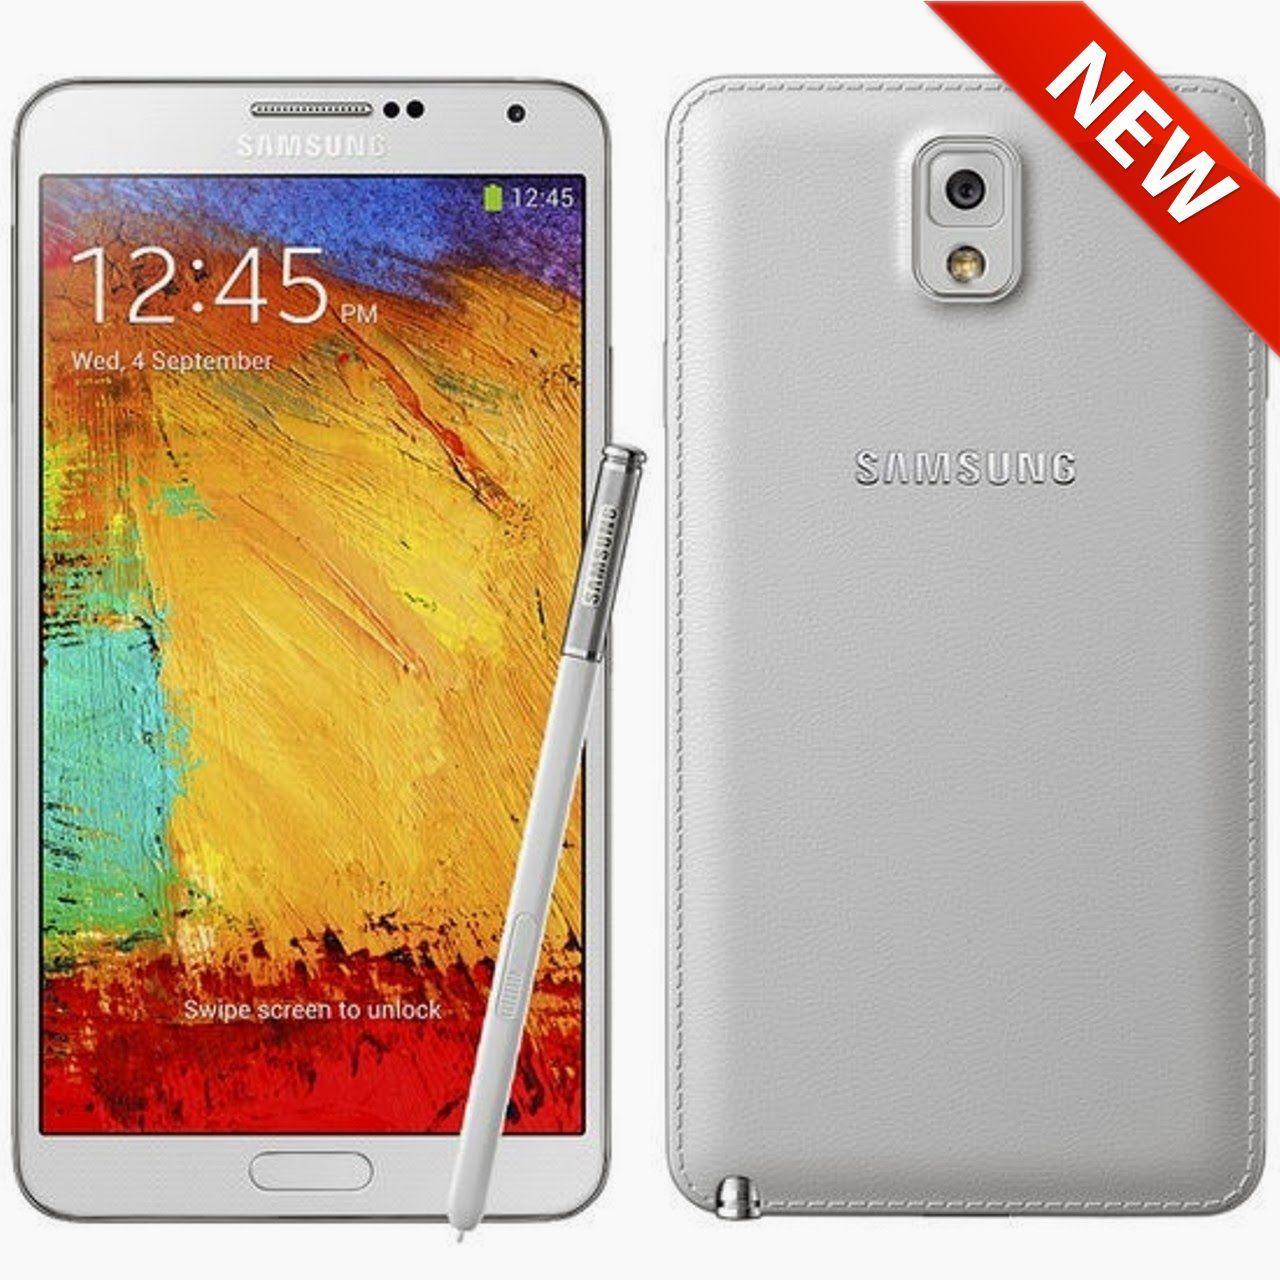 Samsung Galaxy Note 3 SM-N900A - 32GB - White (At) Smartp...